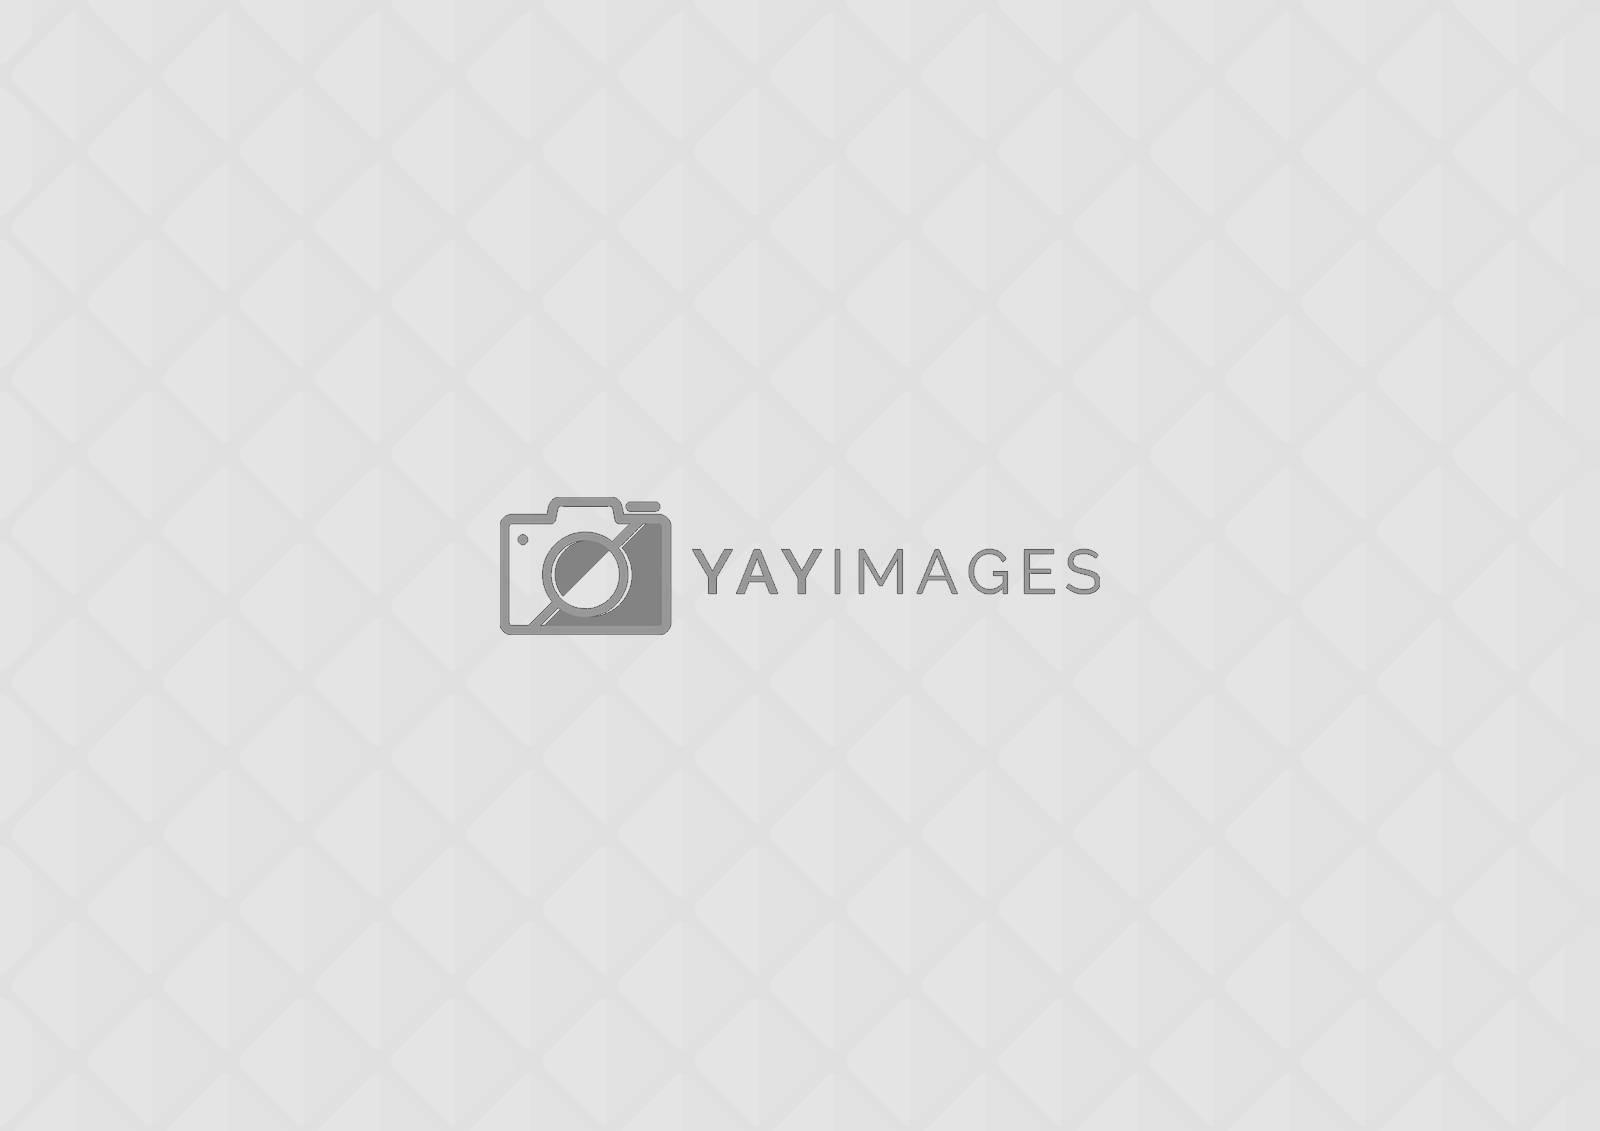 White 3D Grid Texture - Modern Diagonal Pattern on Gray Background, Vector Illustration